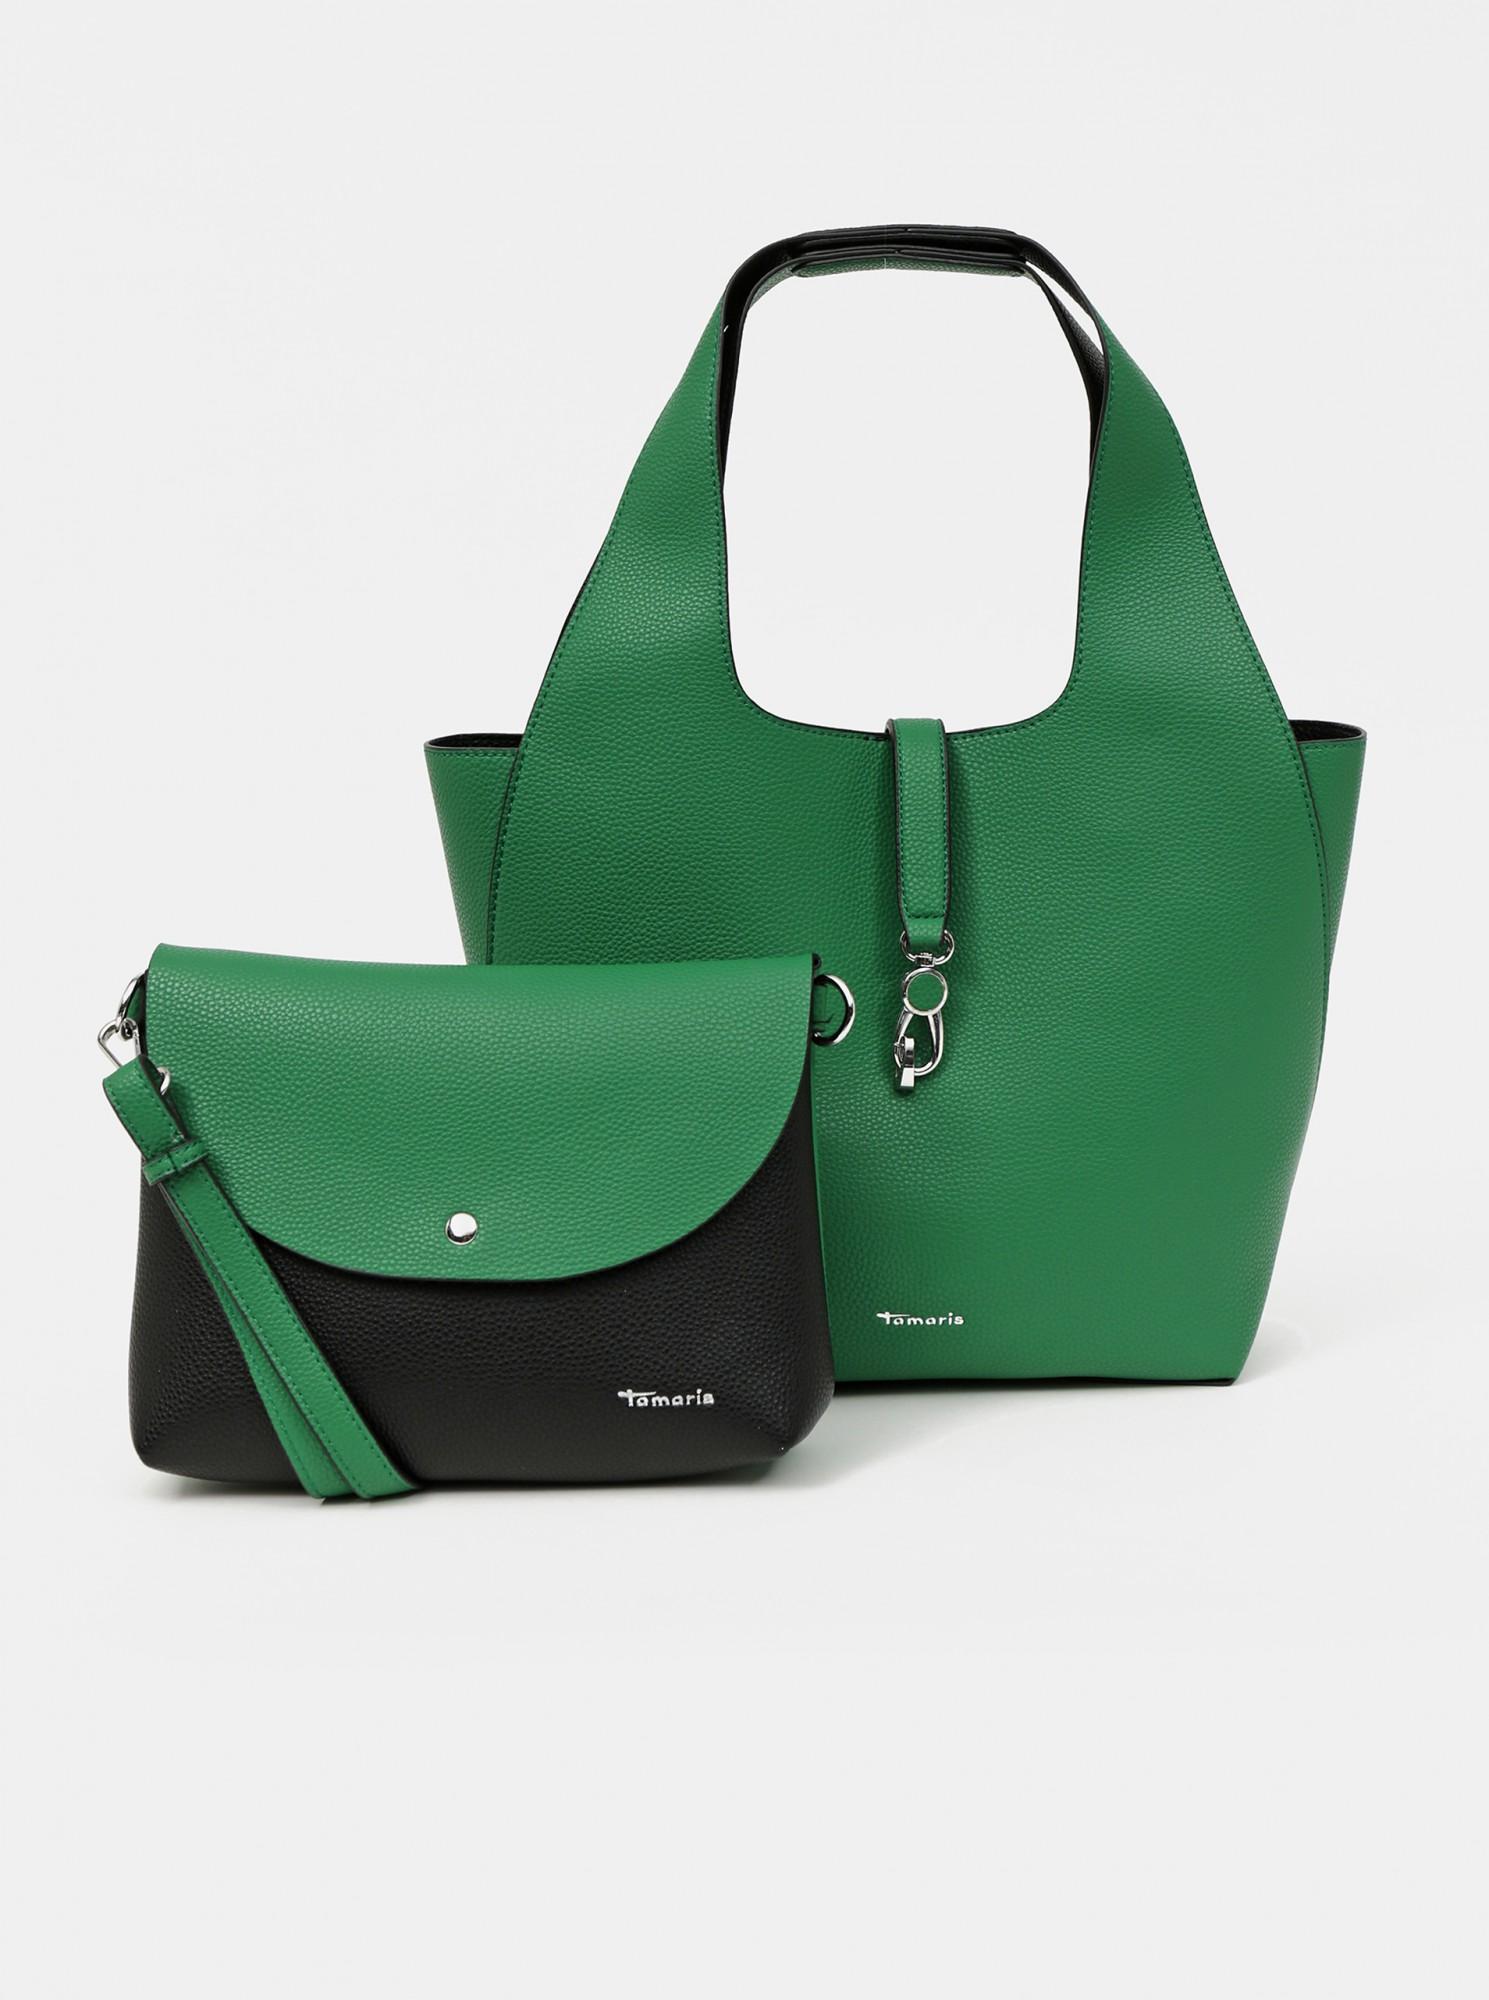 Tamaris green reversible shopper